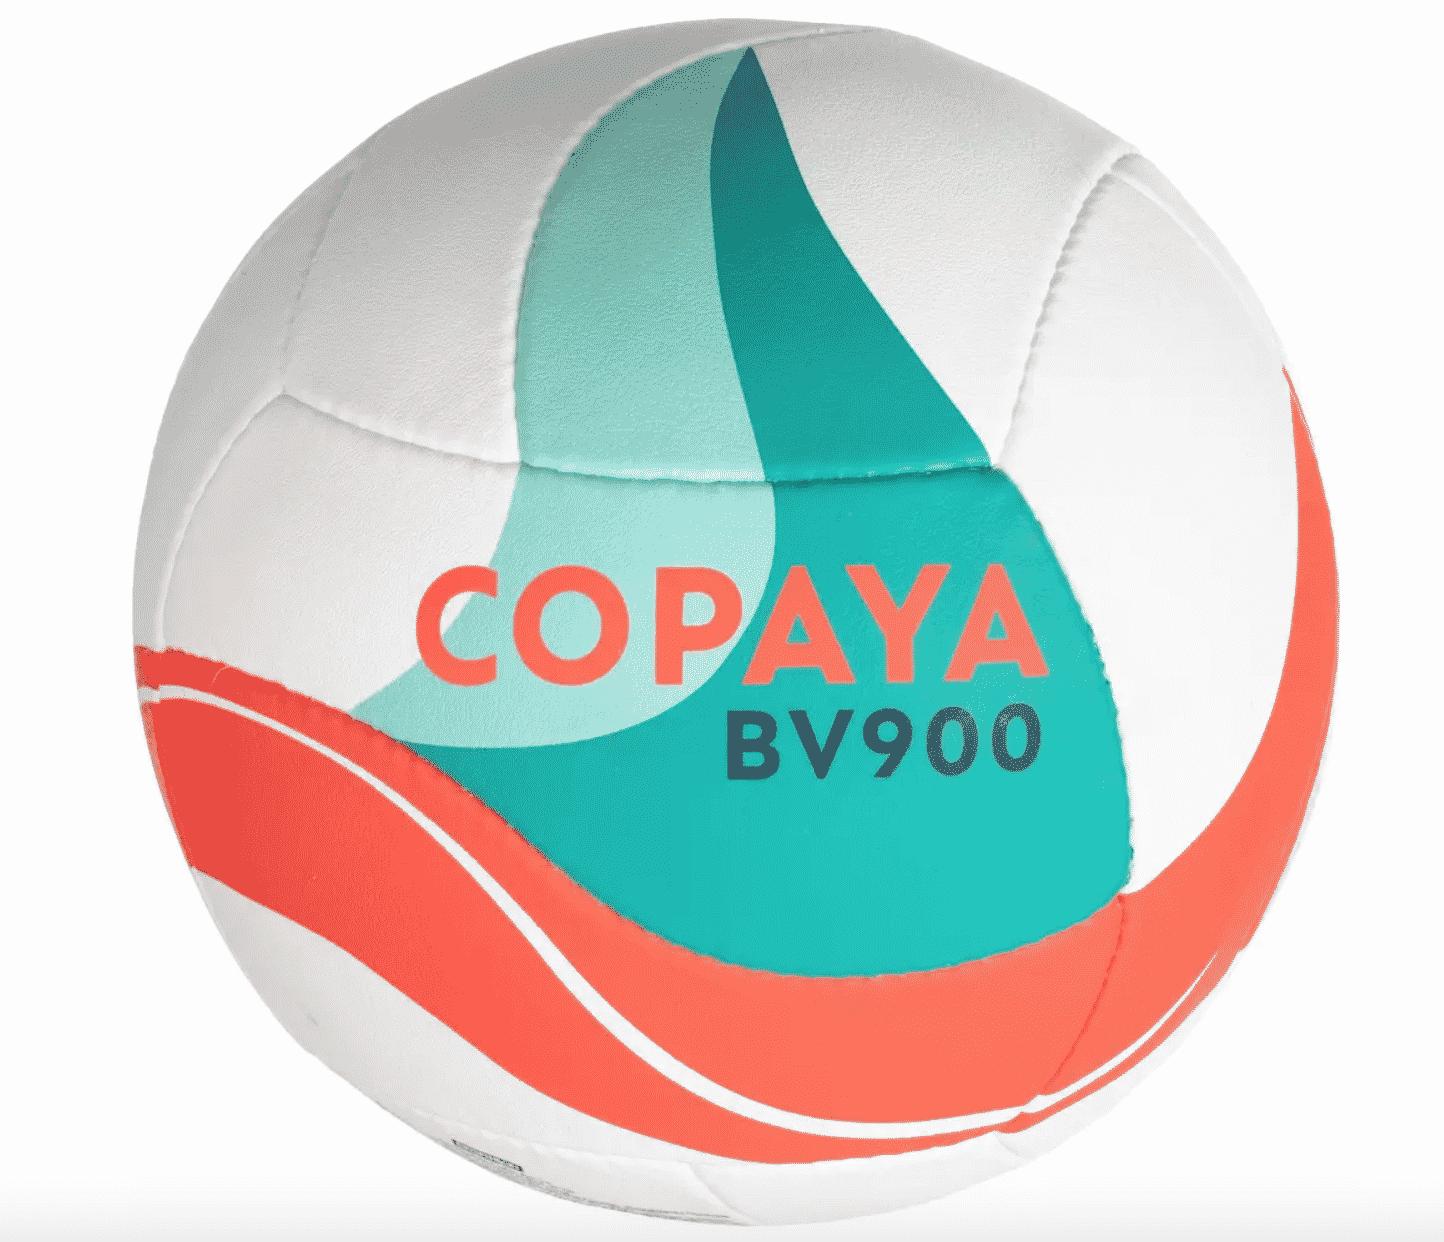 copaya-bv900-ballon-beach-volley-vert-jaune-2020-8